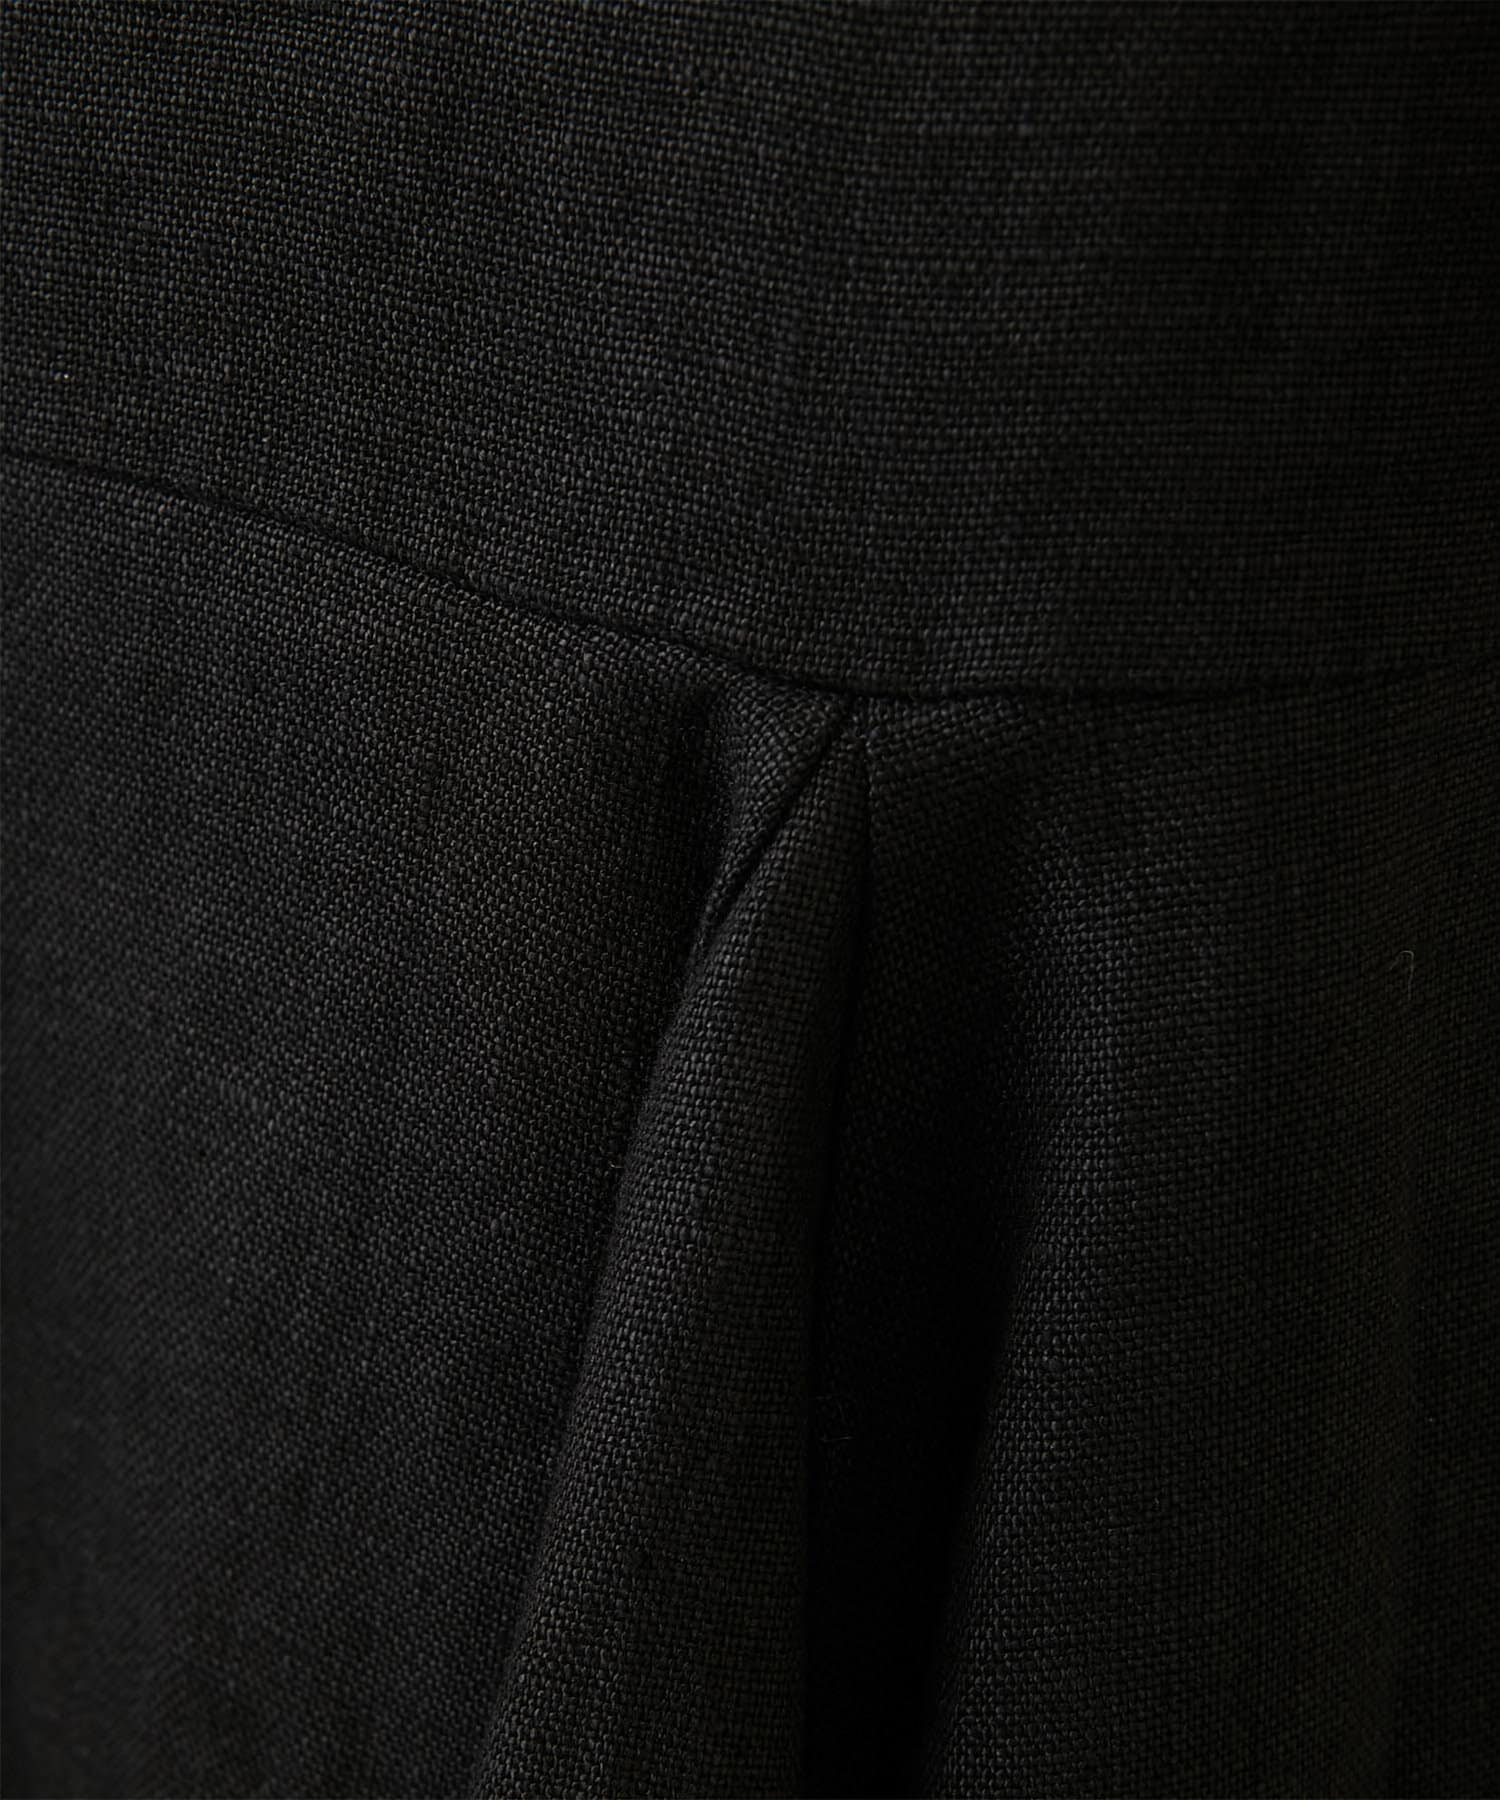 GALLARDAGALANTE(ガリャルダガランテ) 【CEPIE.】リネンヘムフレアースカート